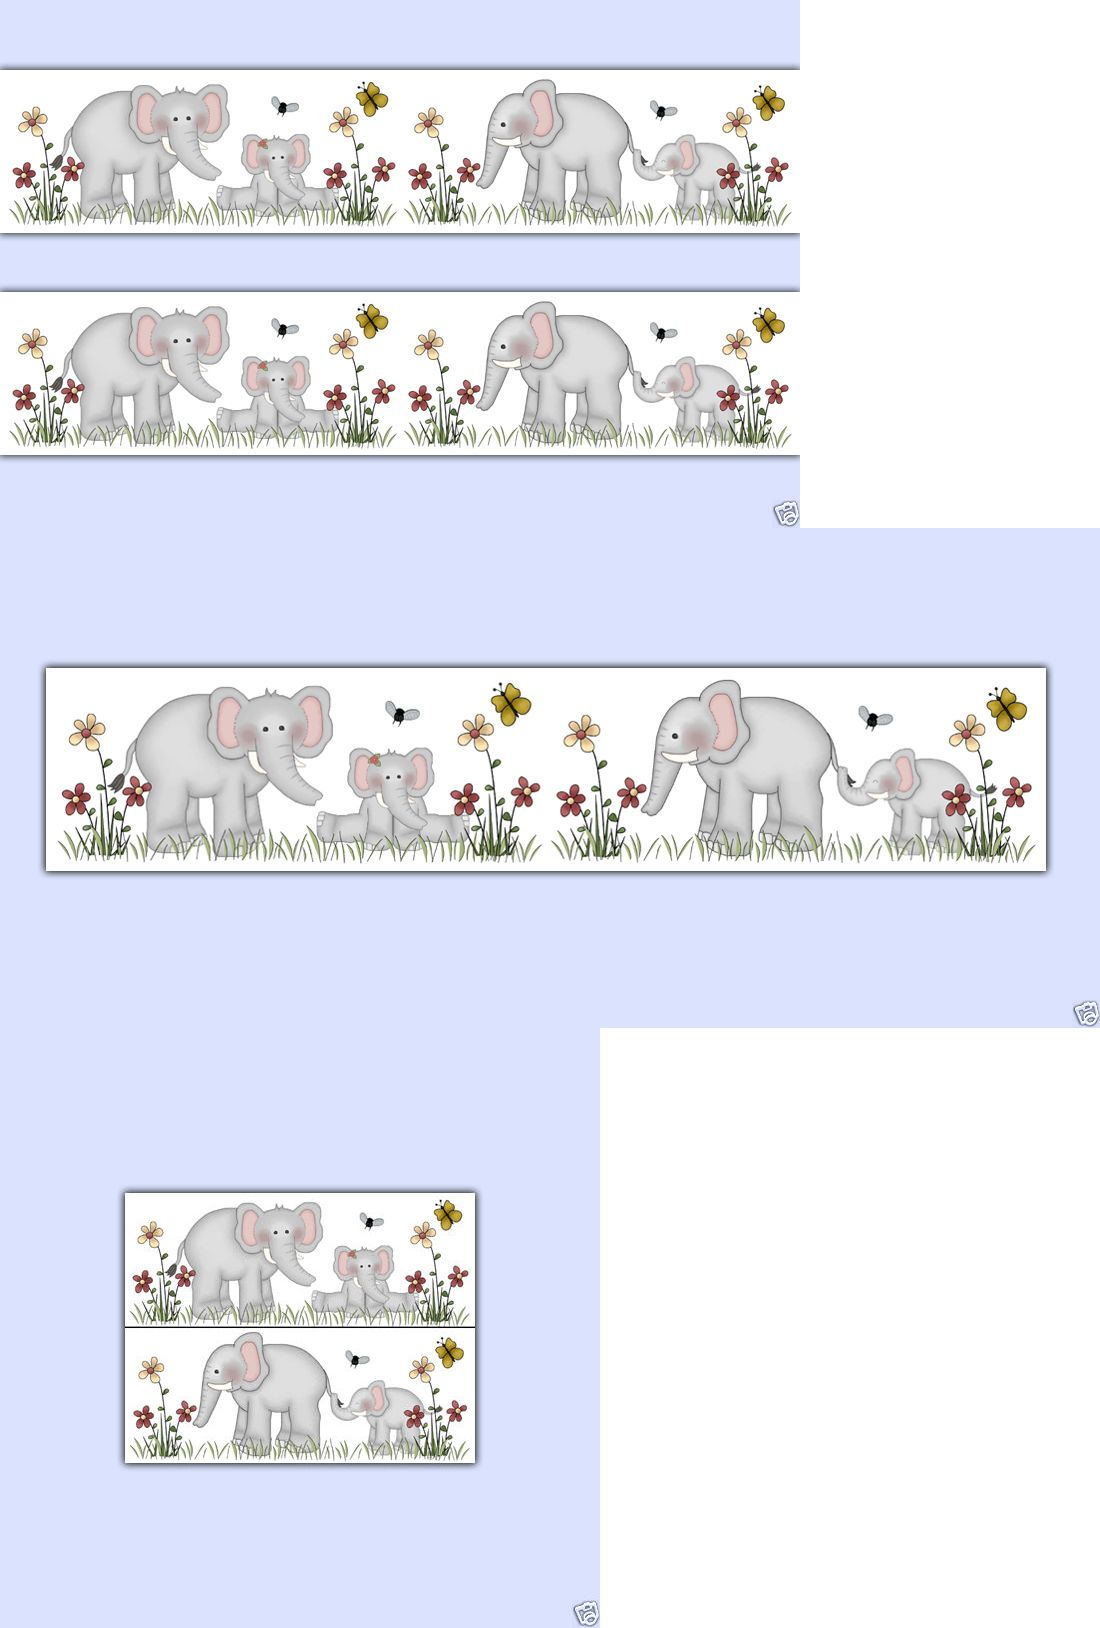 Wallpaper Borders 37636 Elephant Wallpaper Border Wall Decals Baby Jungle Safari Nursery Elephant Wallpaper Elephant Nursery Wallpaper Safari Nursery Stickers